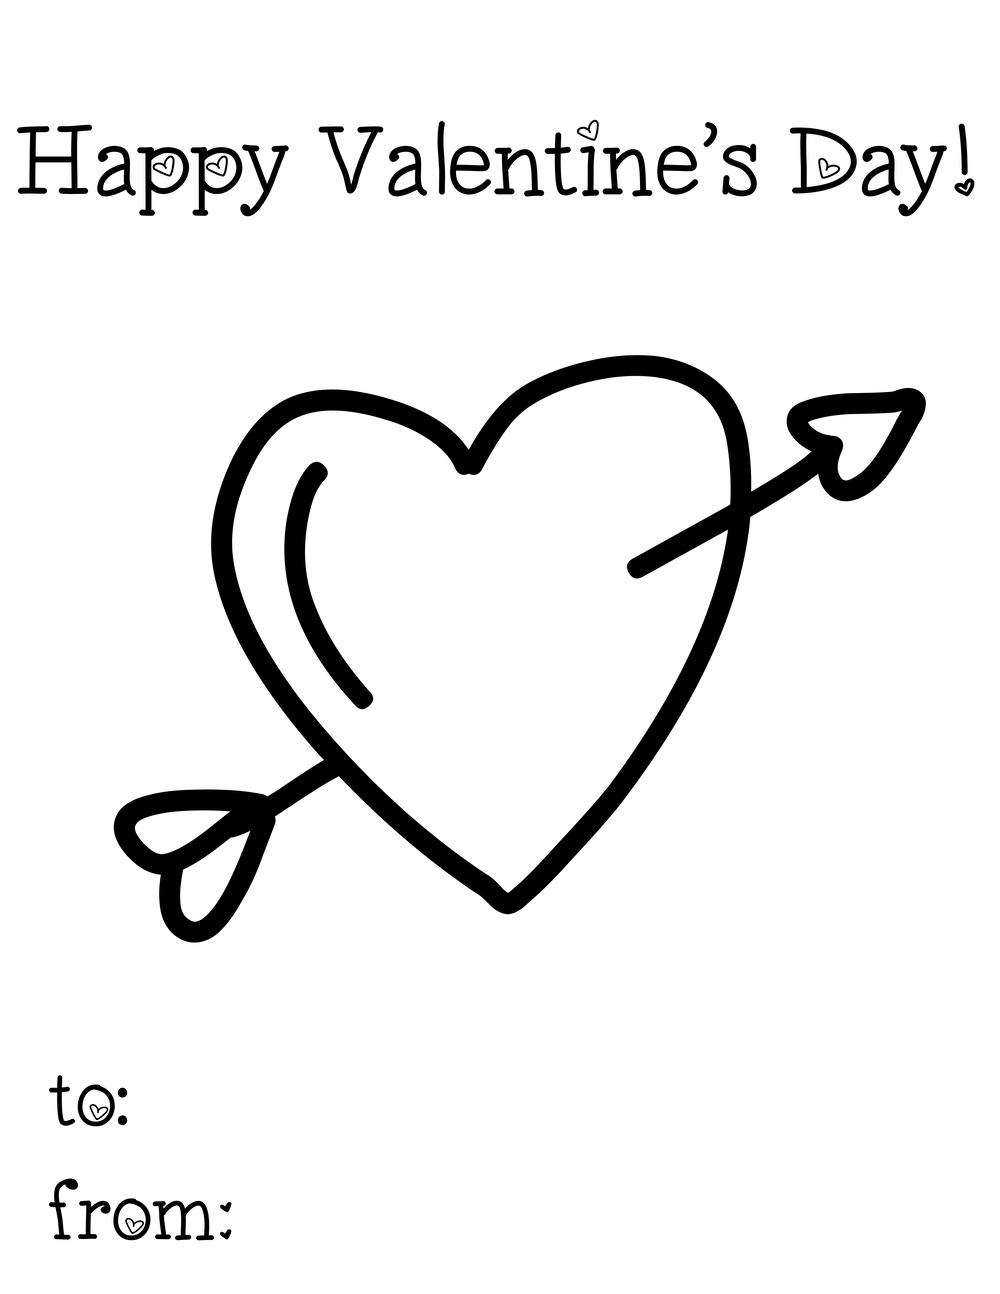 Printable Heart Valentine Day Card